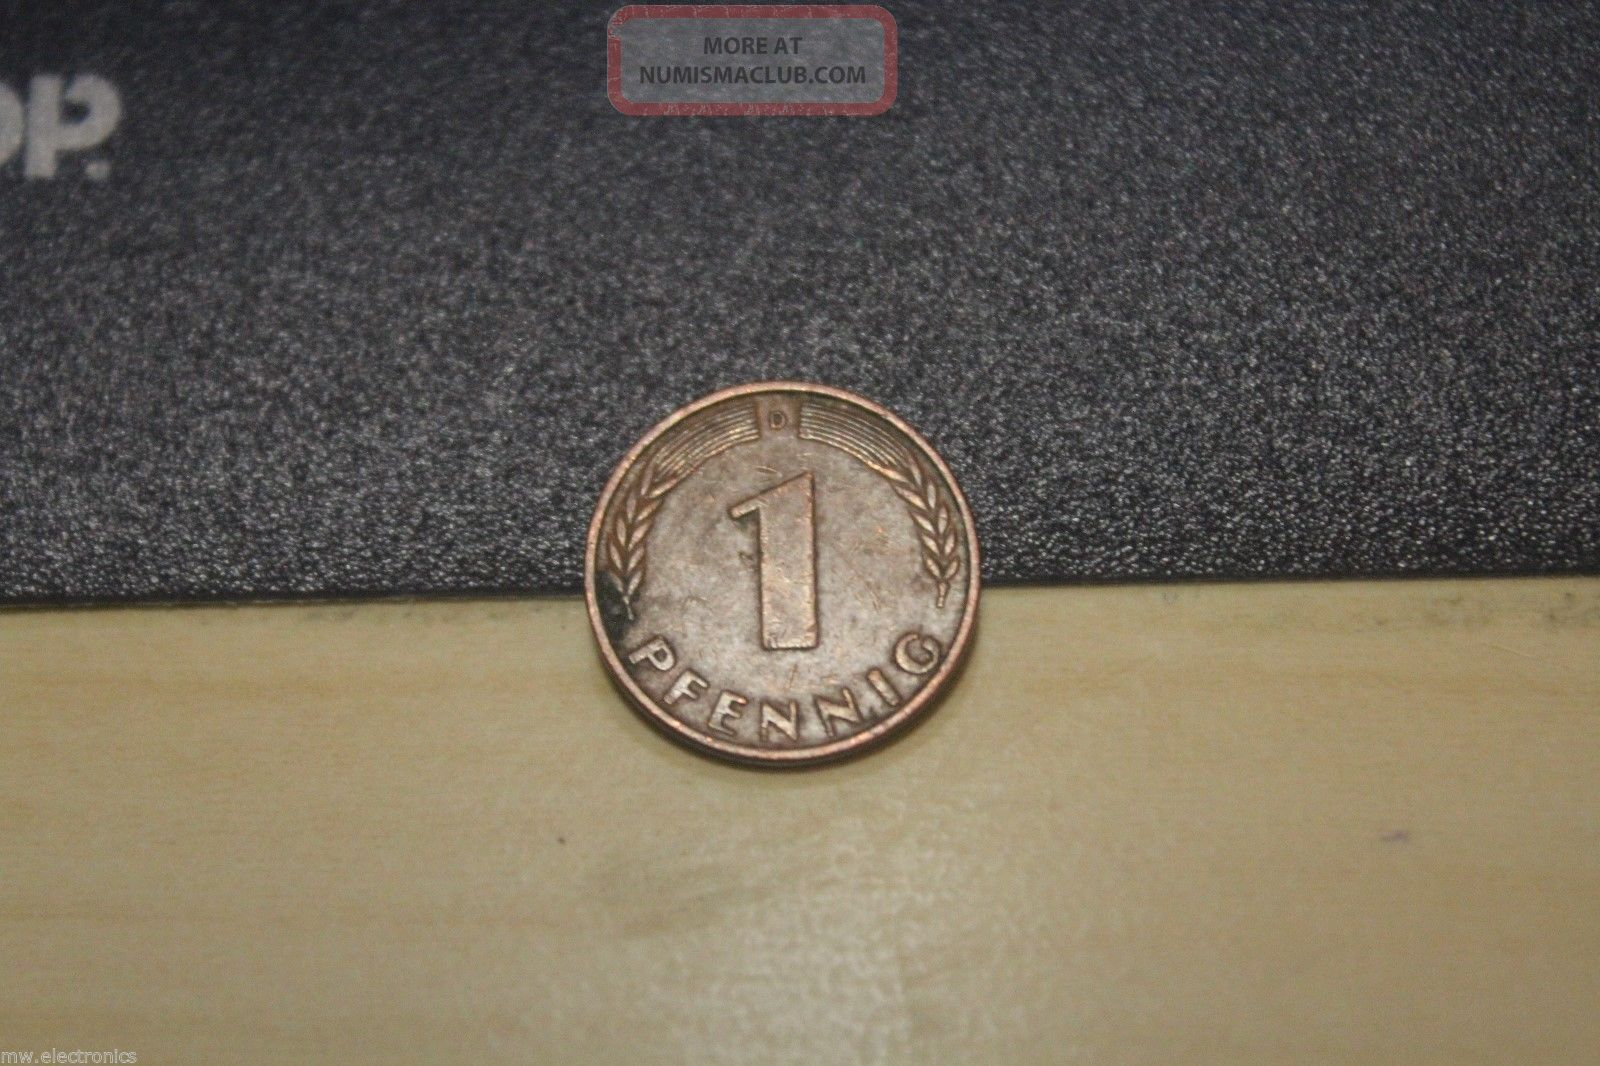 1950 1 pfennig bundesrepublik deutschland coin. Black Bedroom Furniture Sets. Home Design Ideas